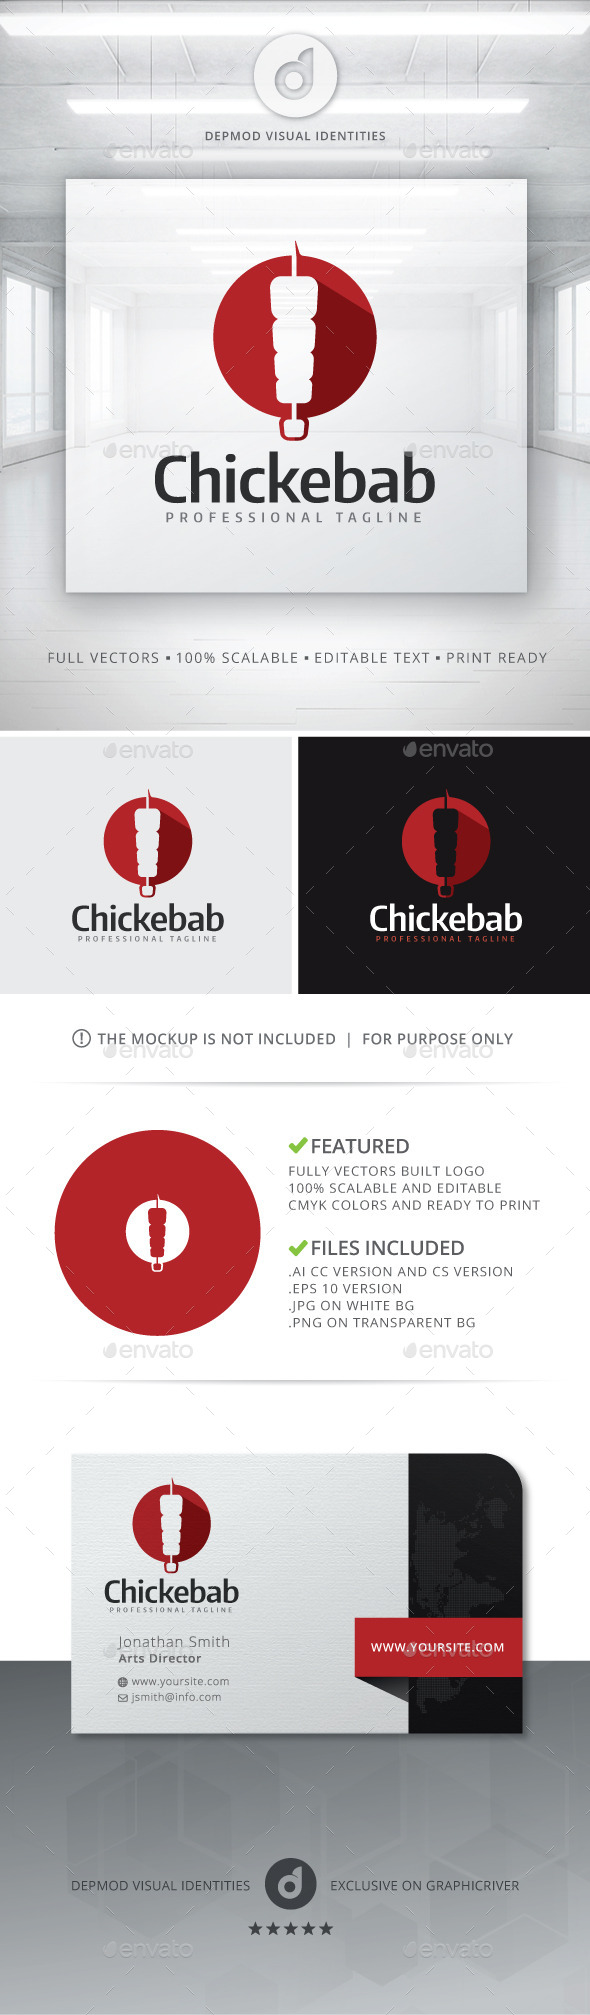 GraphicRiver Chickebab Logo 11356358